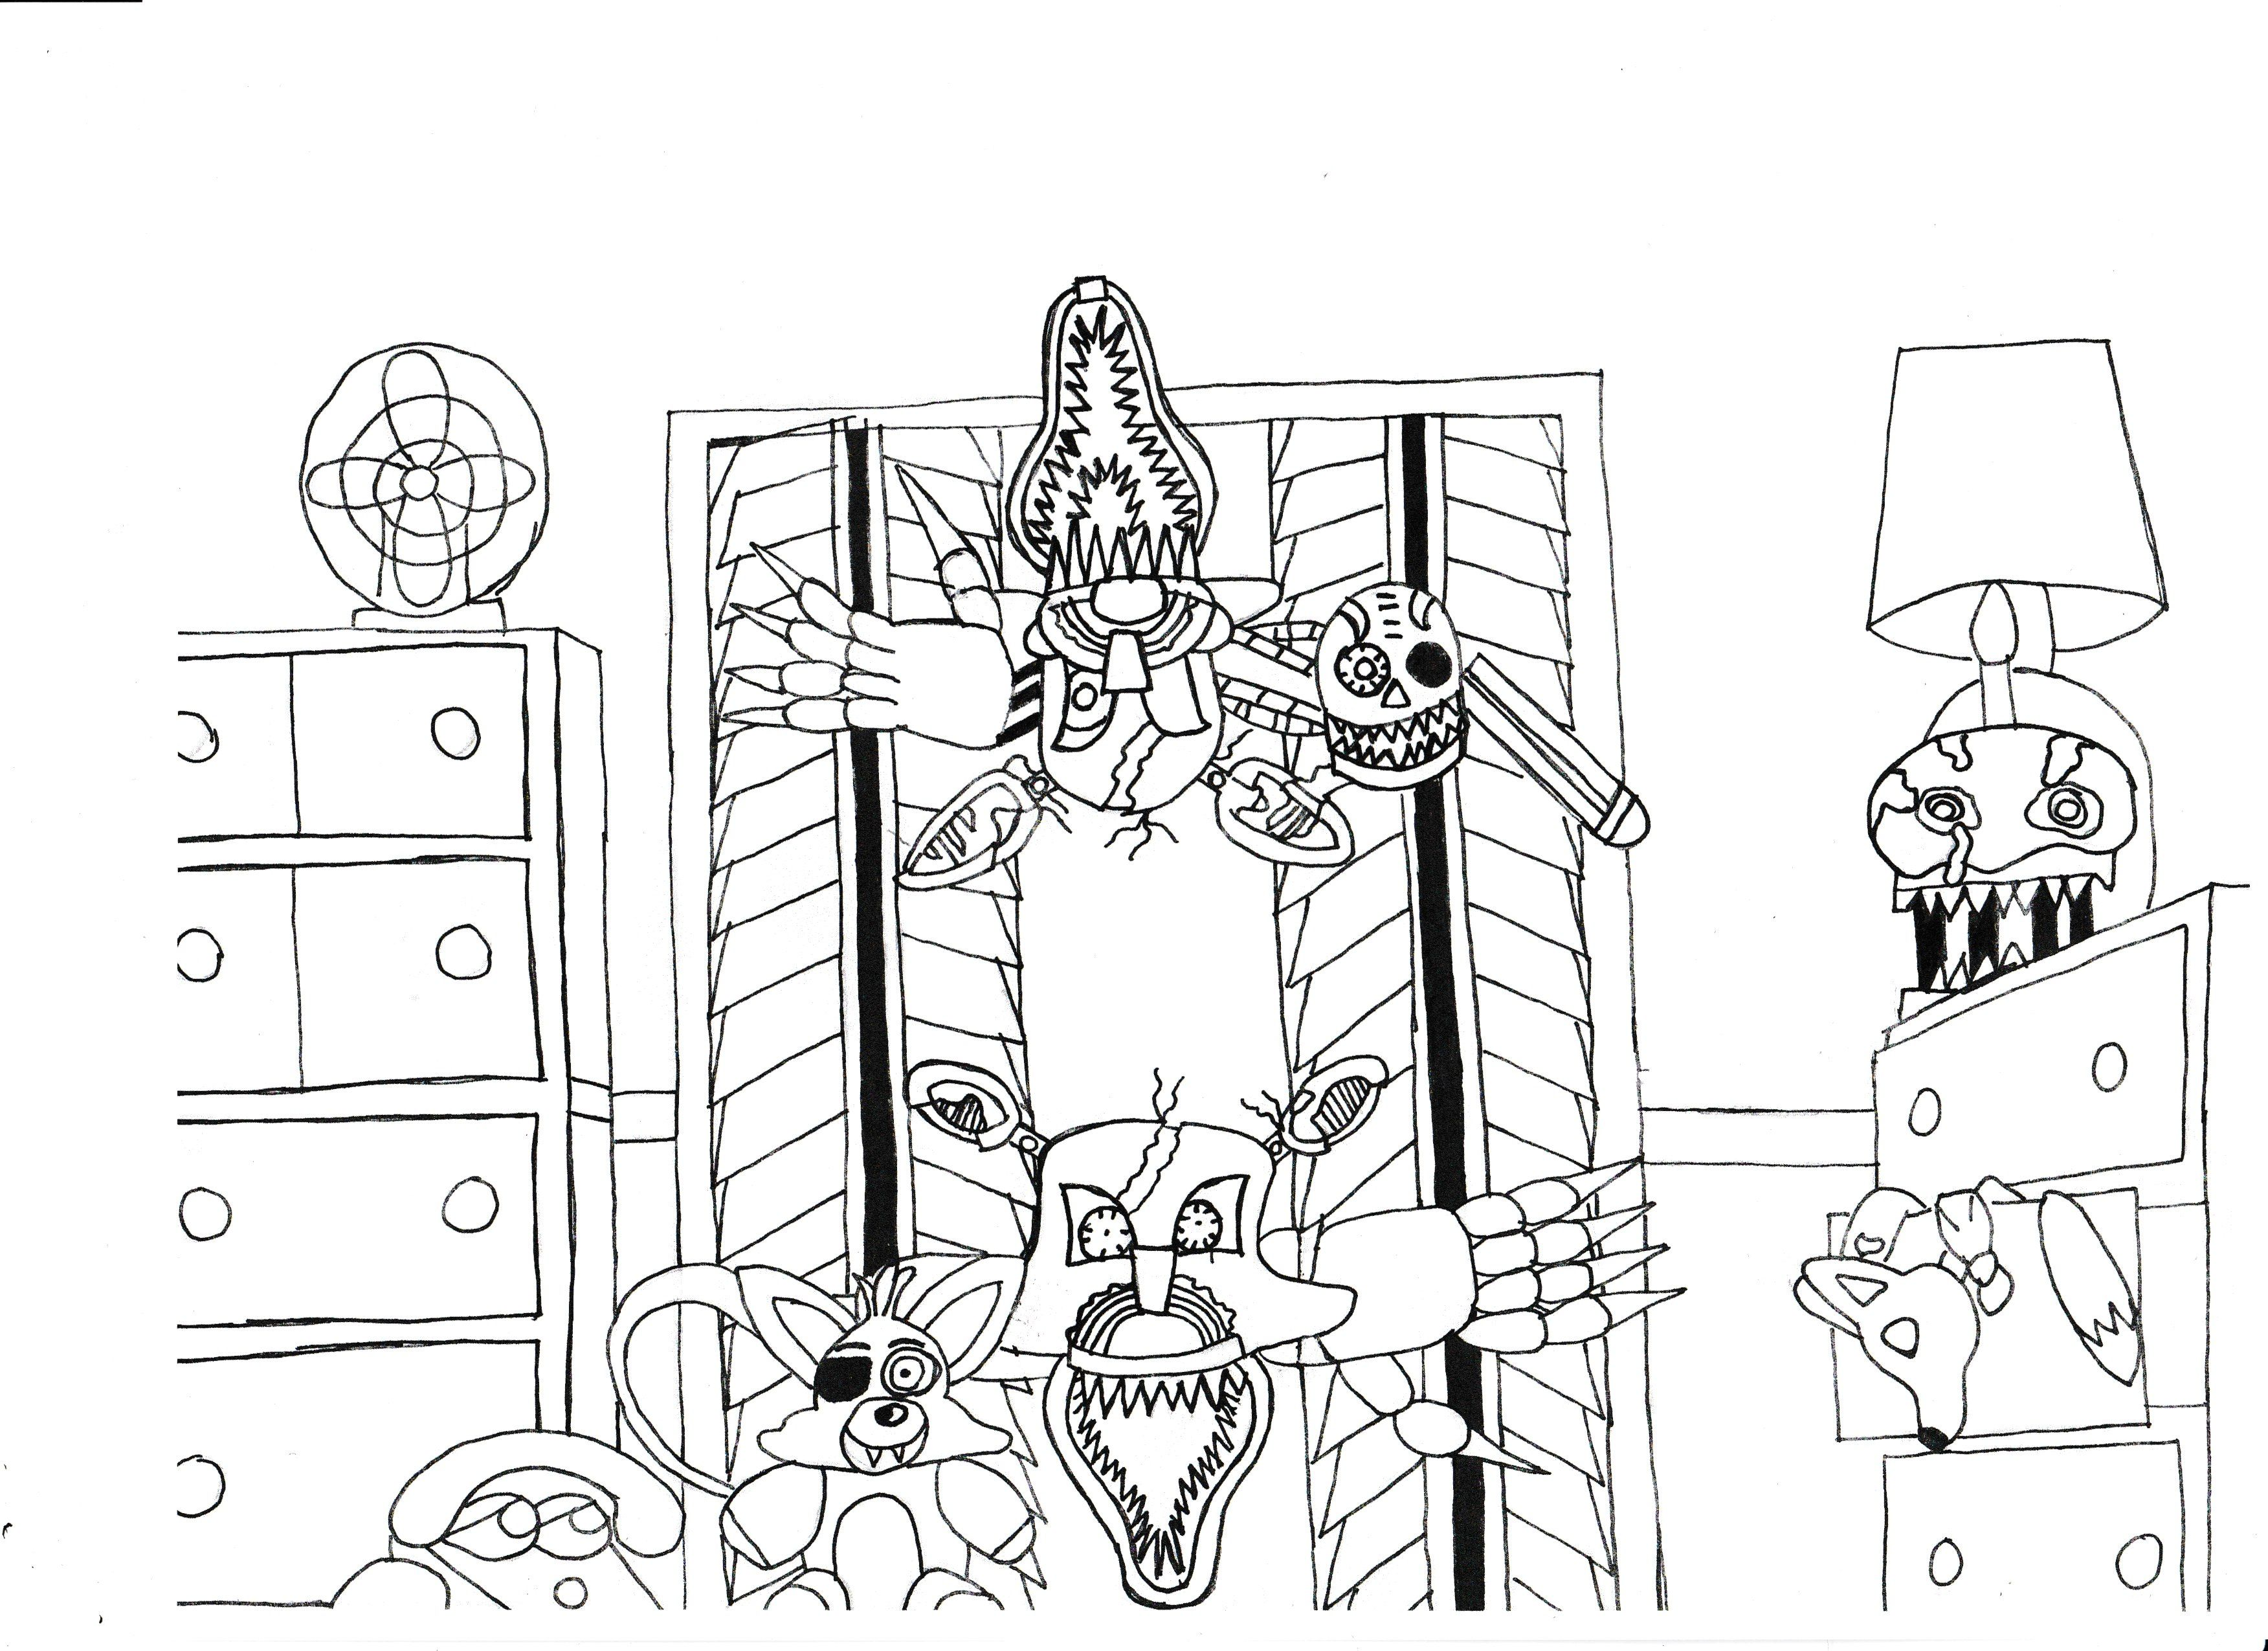 Fnaf 4 drawing | My drawings, Drawings, Decor